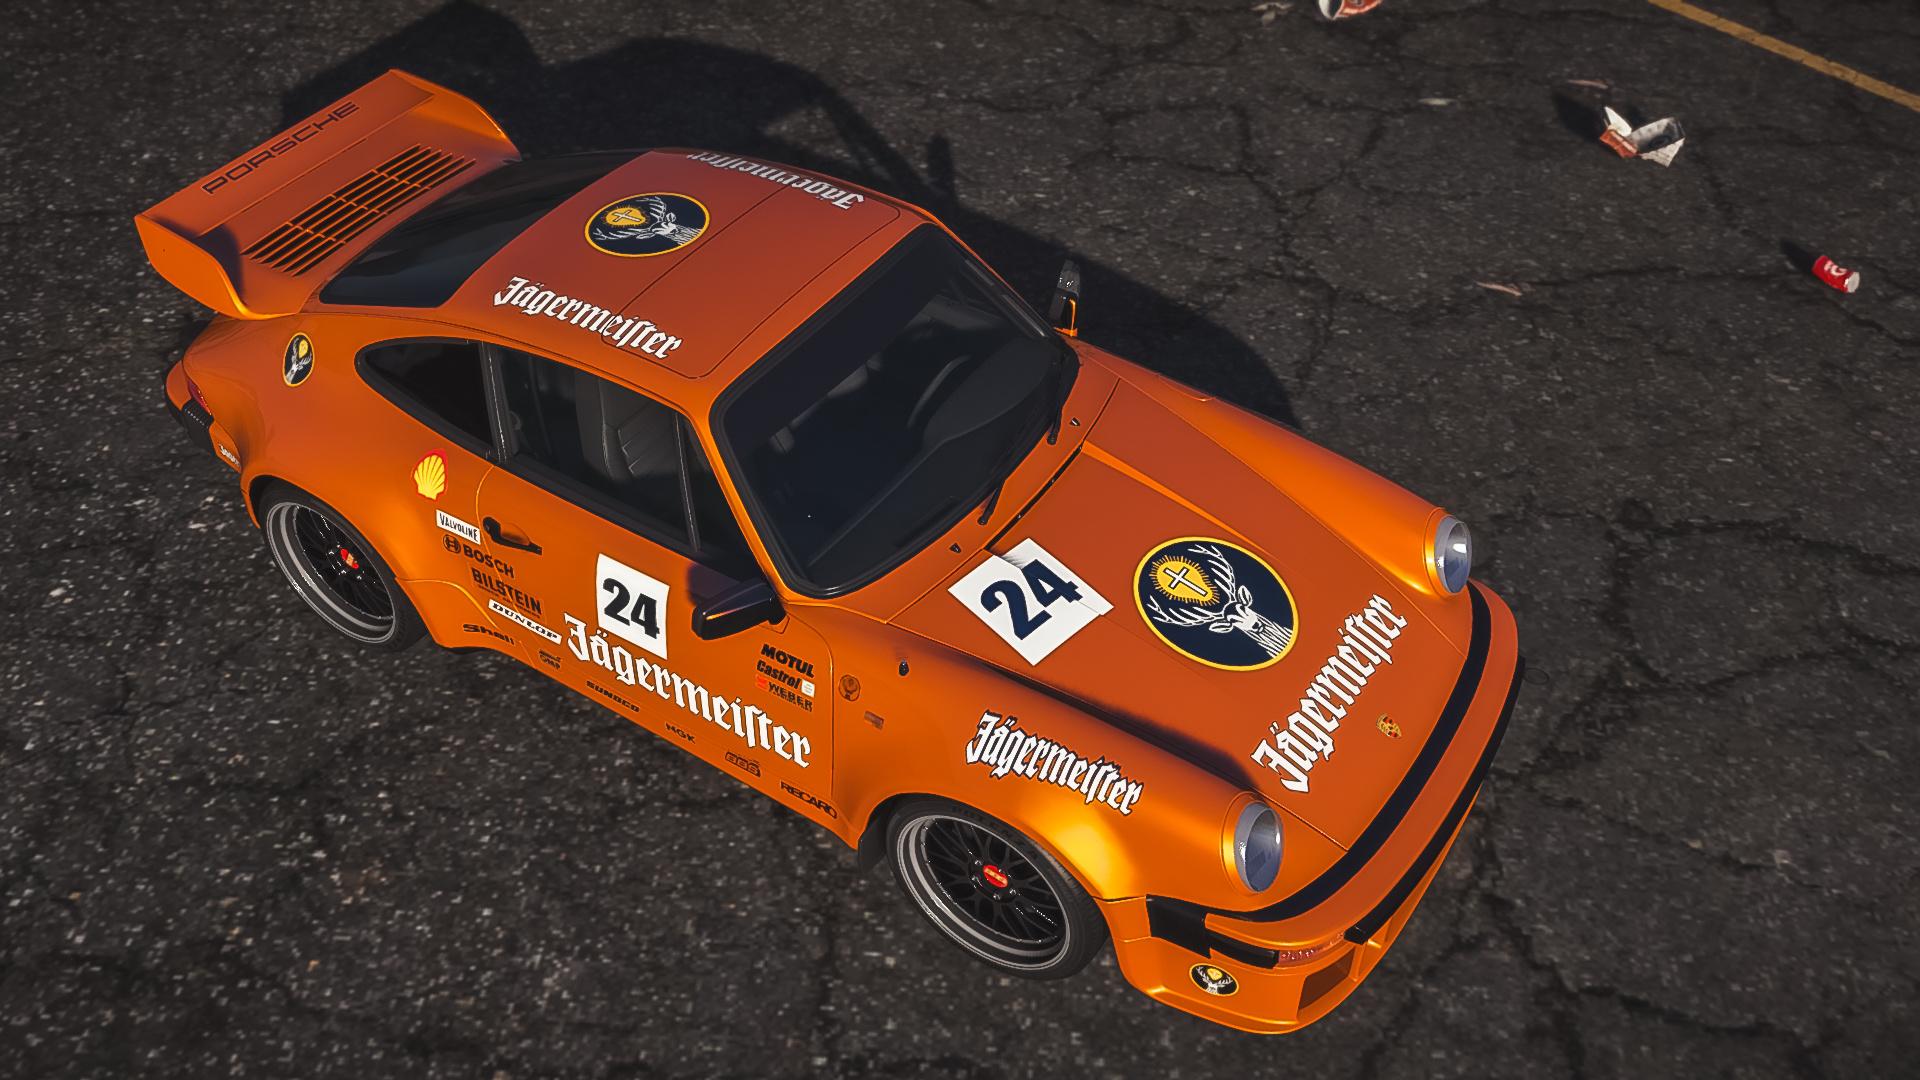 1982 Porsche 911 Turbo 930 Jagermeister Livery Gta5 Mods Com